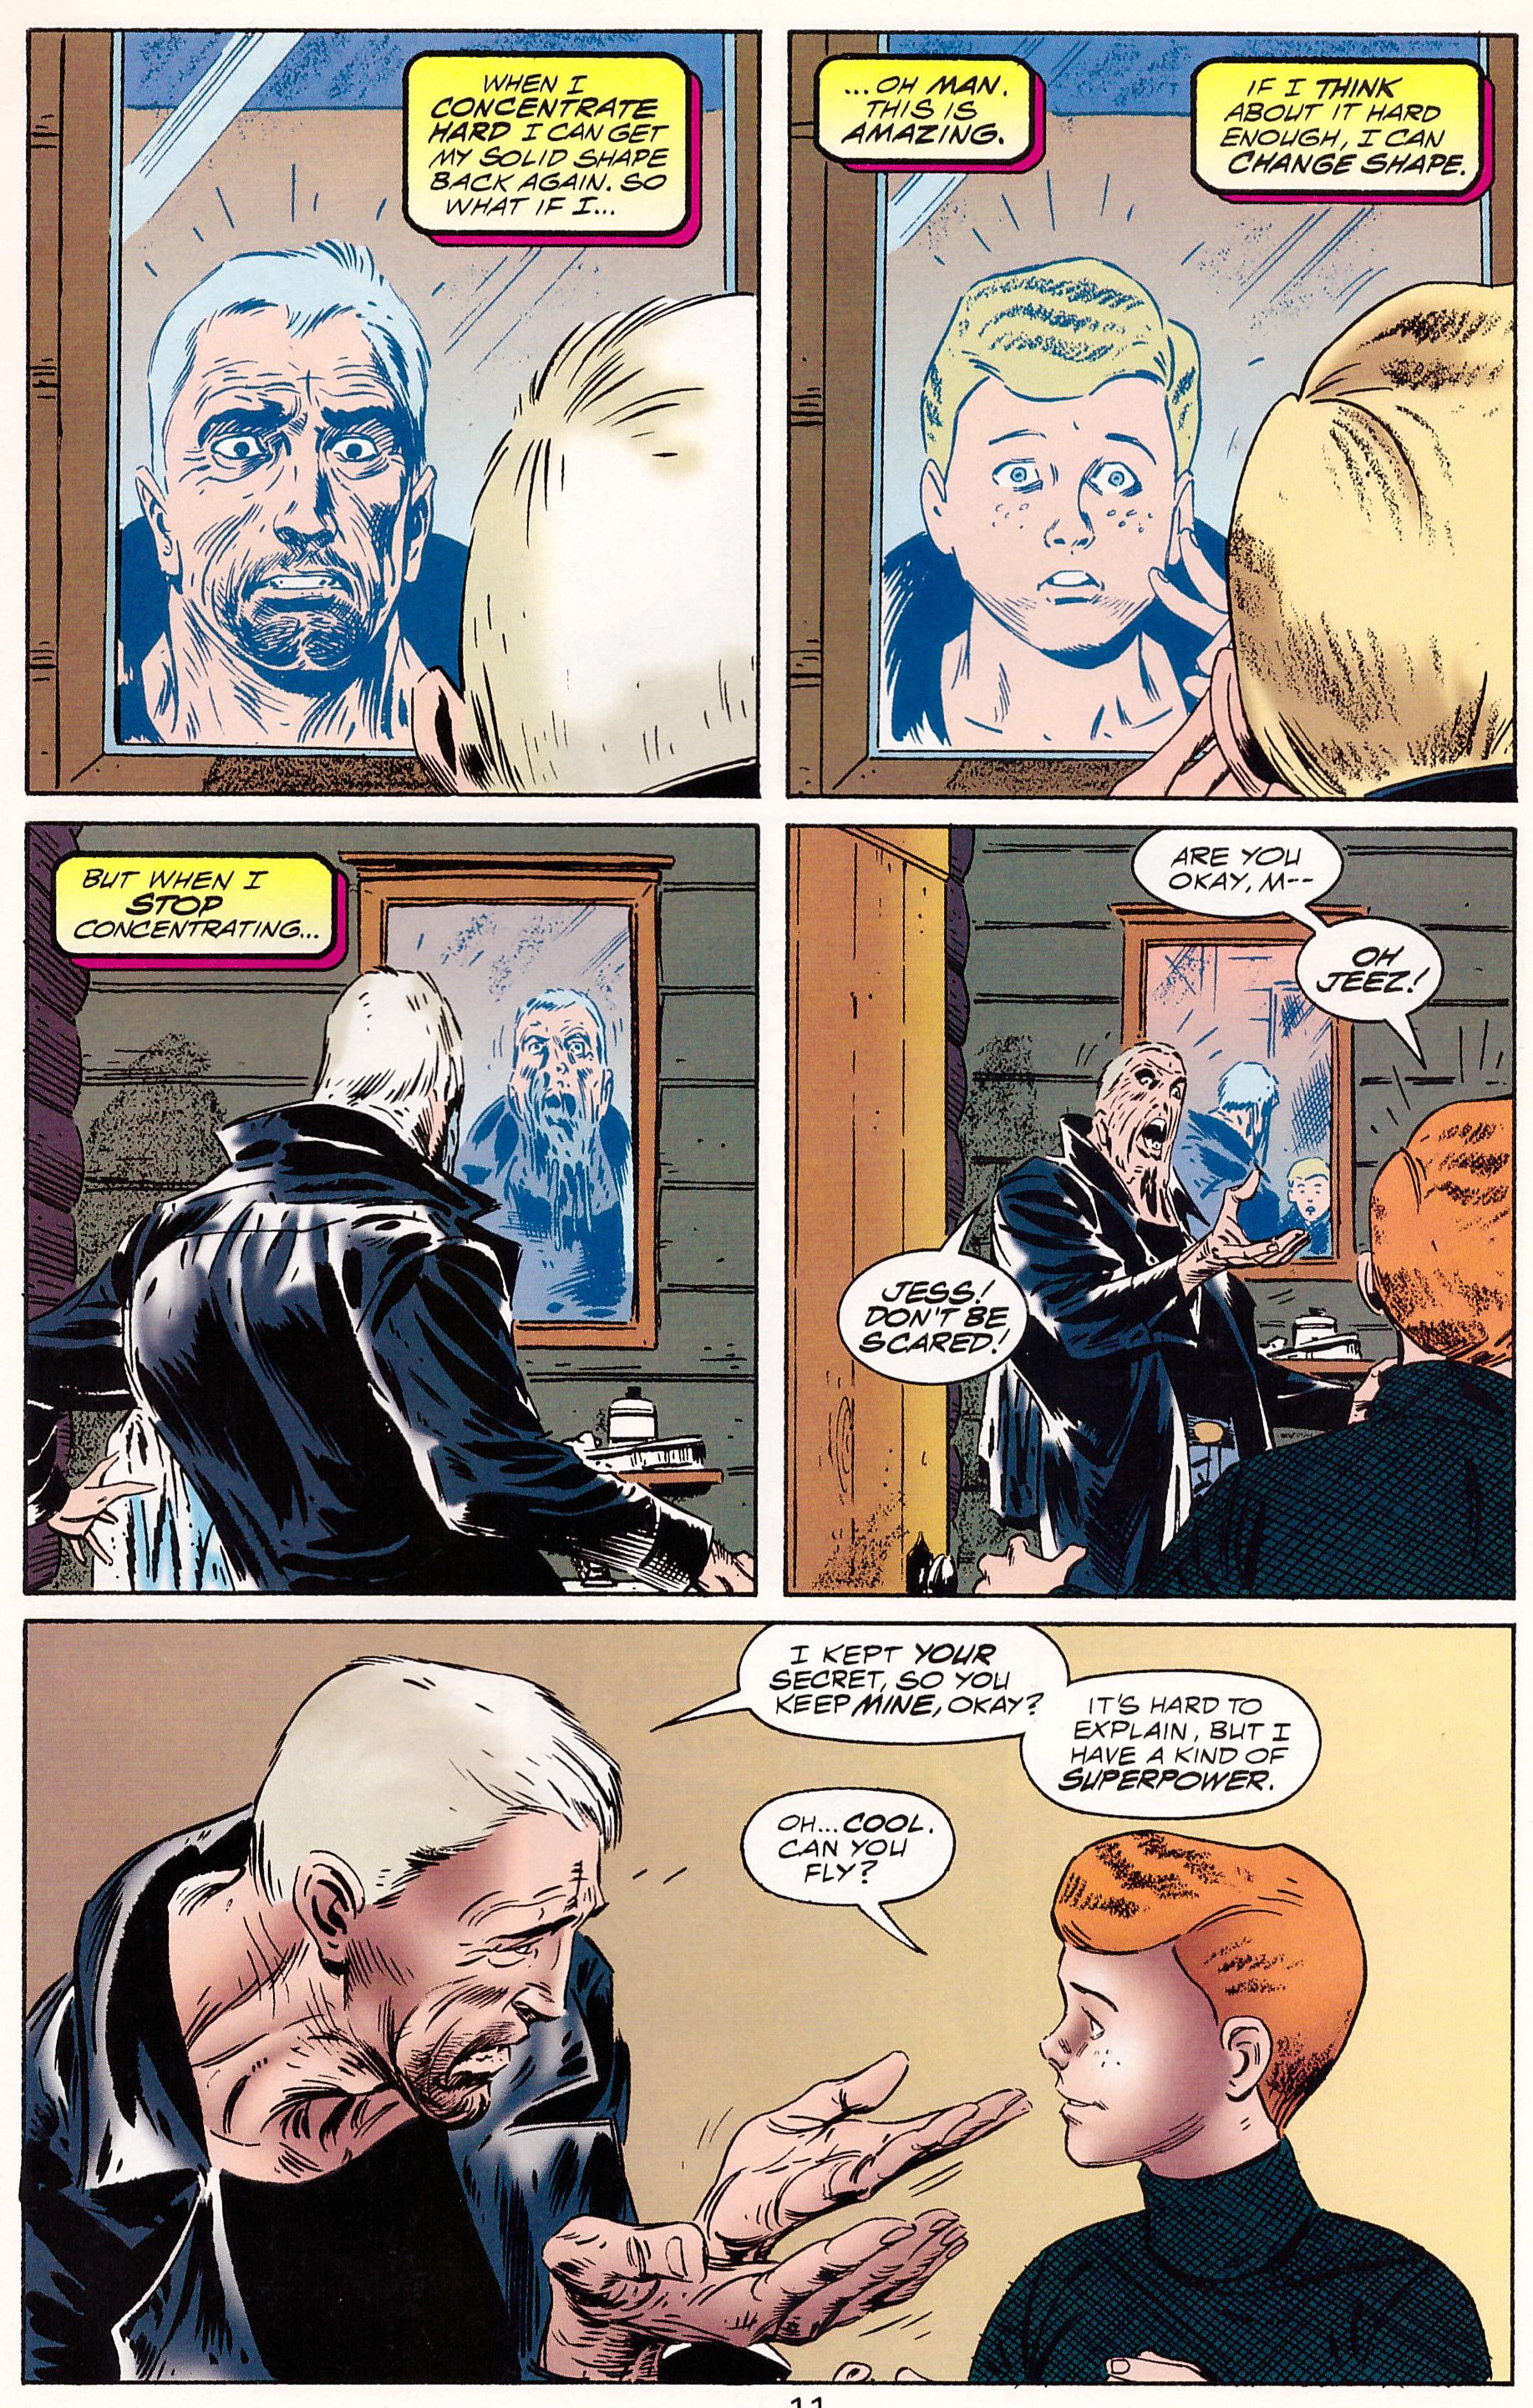 Resurrection Man vol 1 graphic novel review